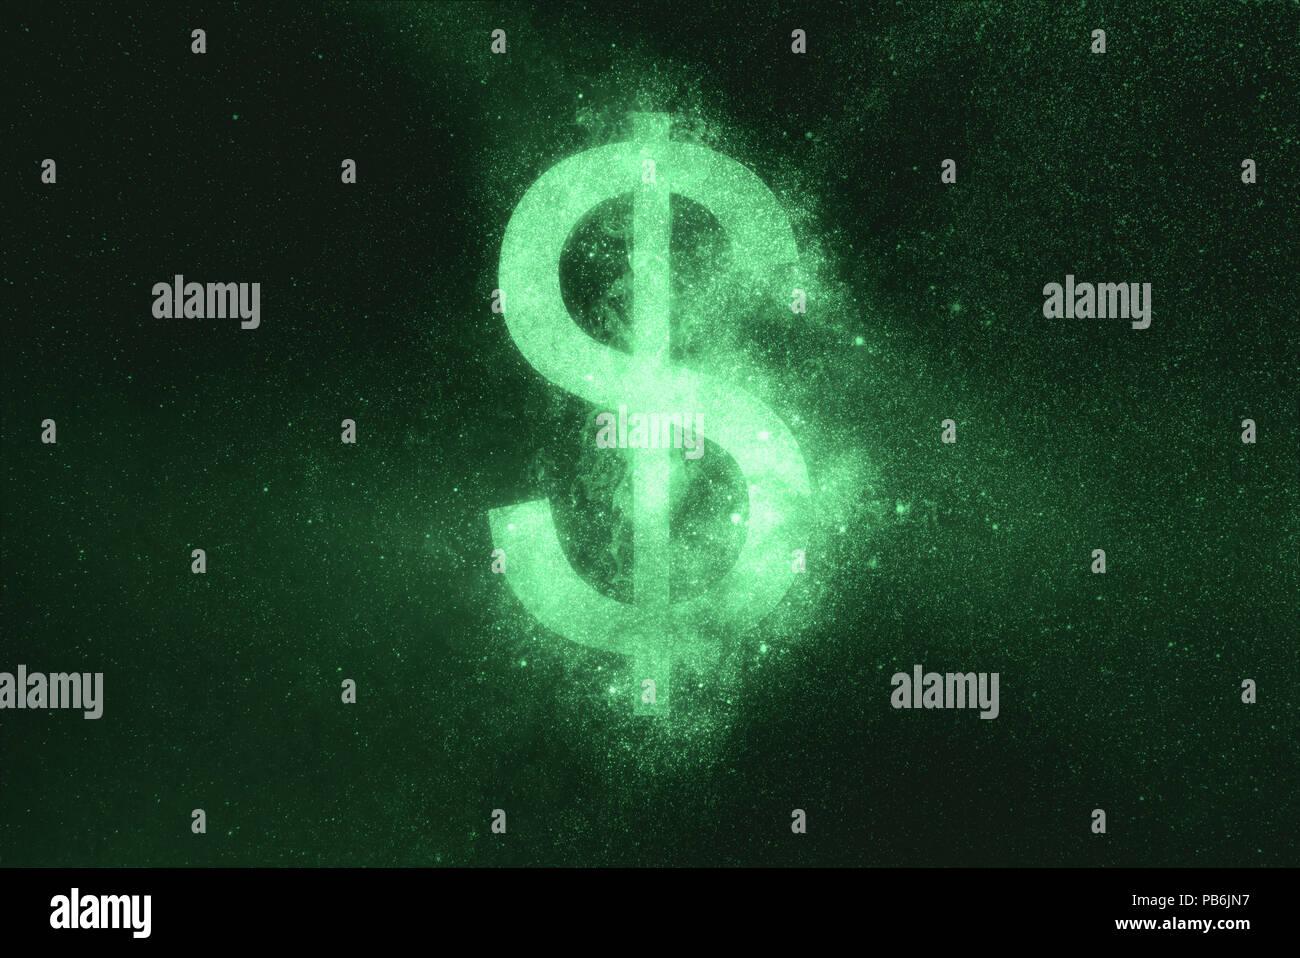 Signo de dólar, símbolo de dólar. Símbolo verde Imagen De Stock